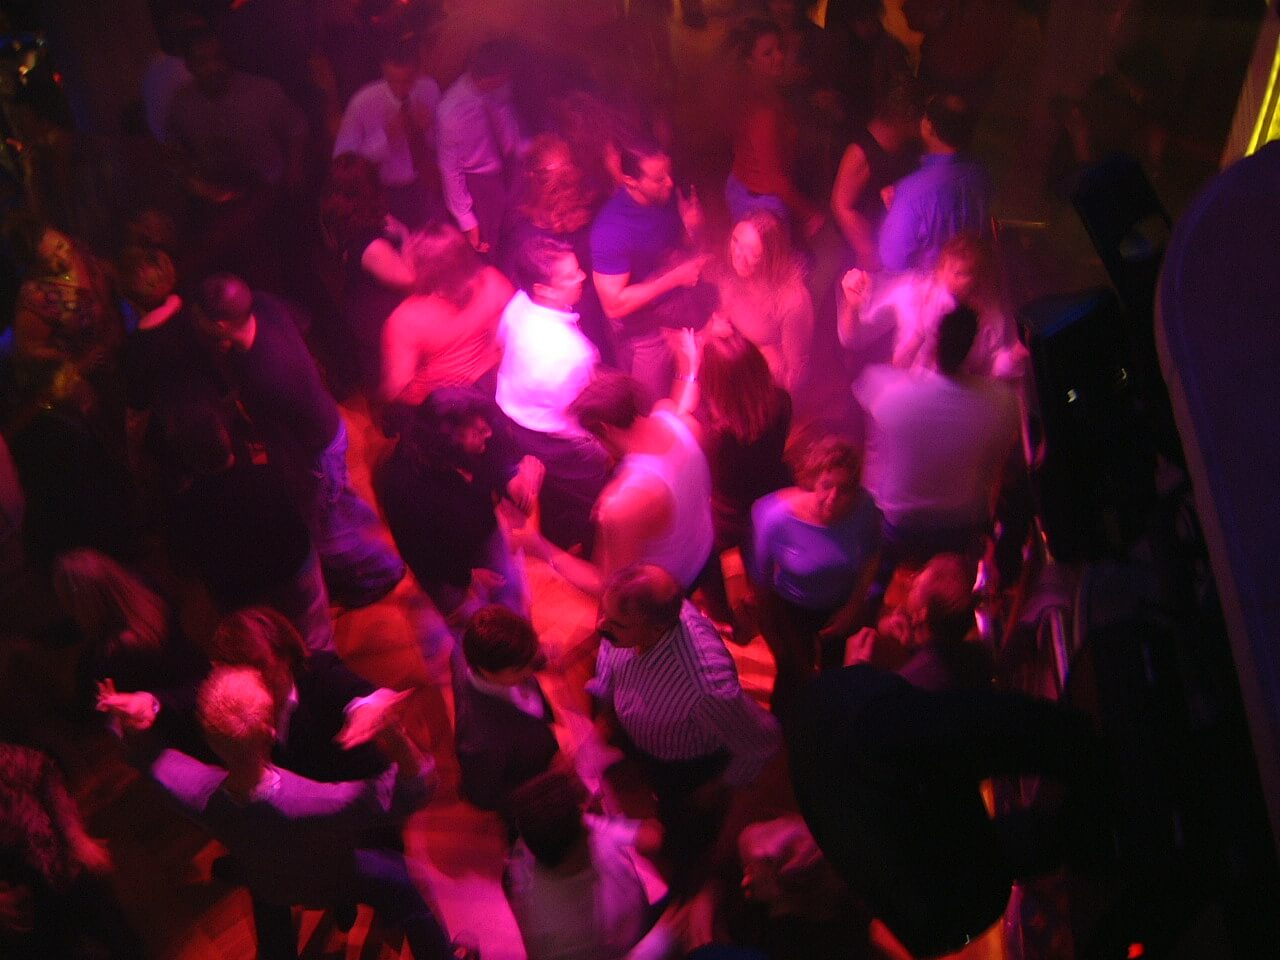 Круизный лайнер Explorer of the Seas - Дискотека (Nightclub Dance)